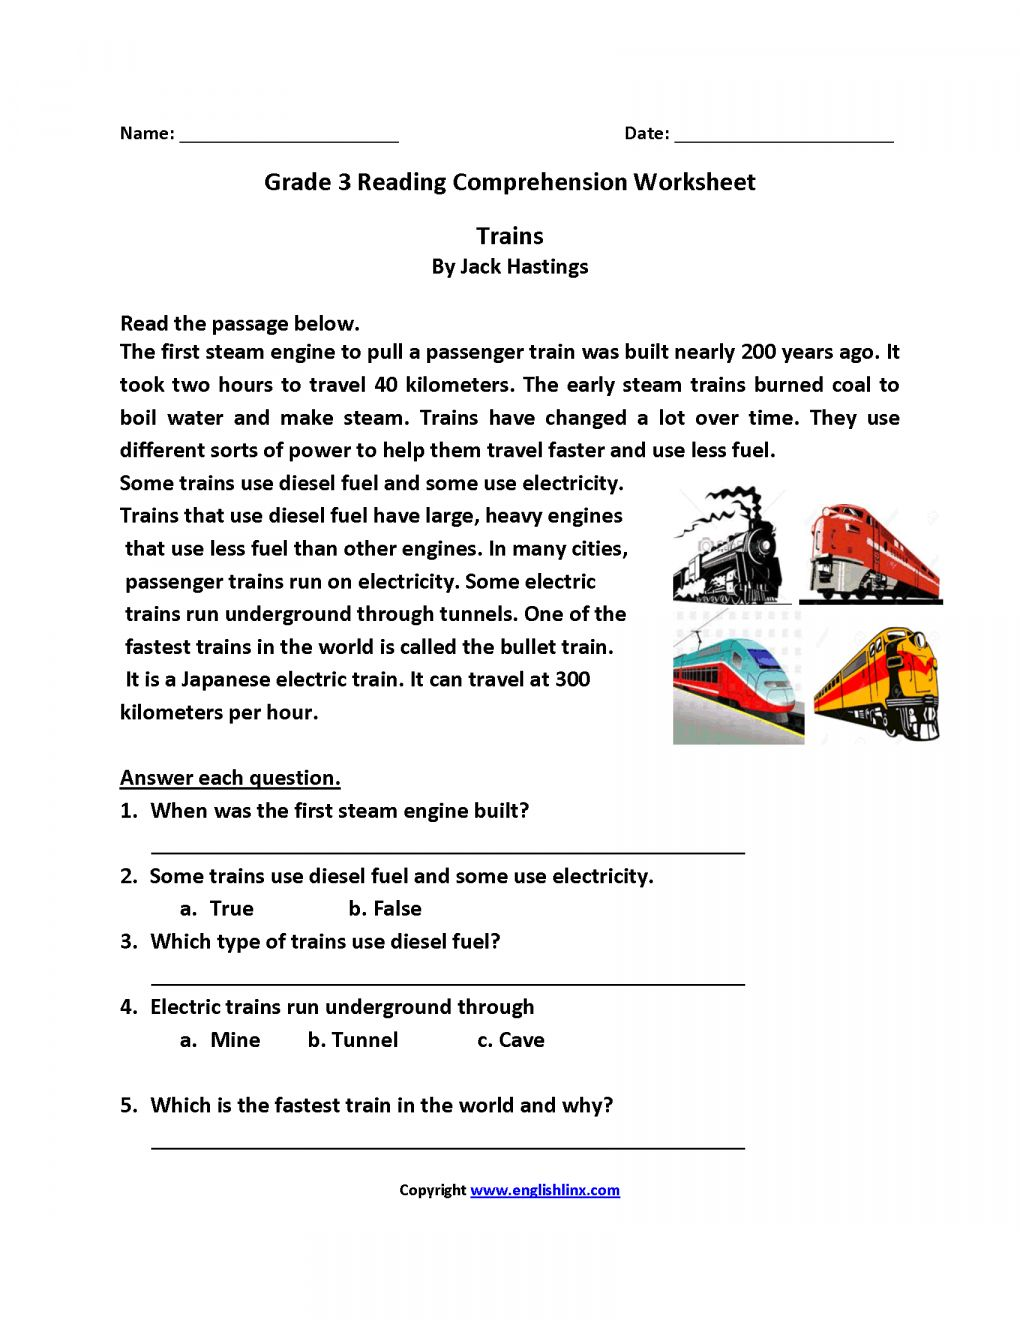 hight resolution of 16+ Reading Worksheets For 3Rd Grade - Chart-sheet.com   Reading  comprehension worksheets